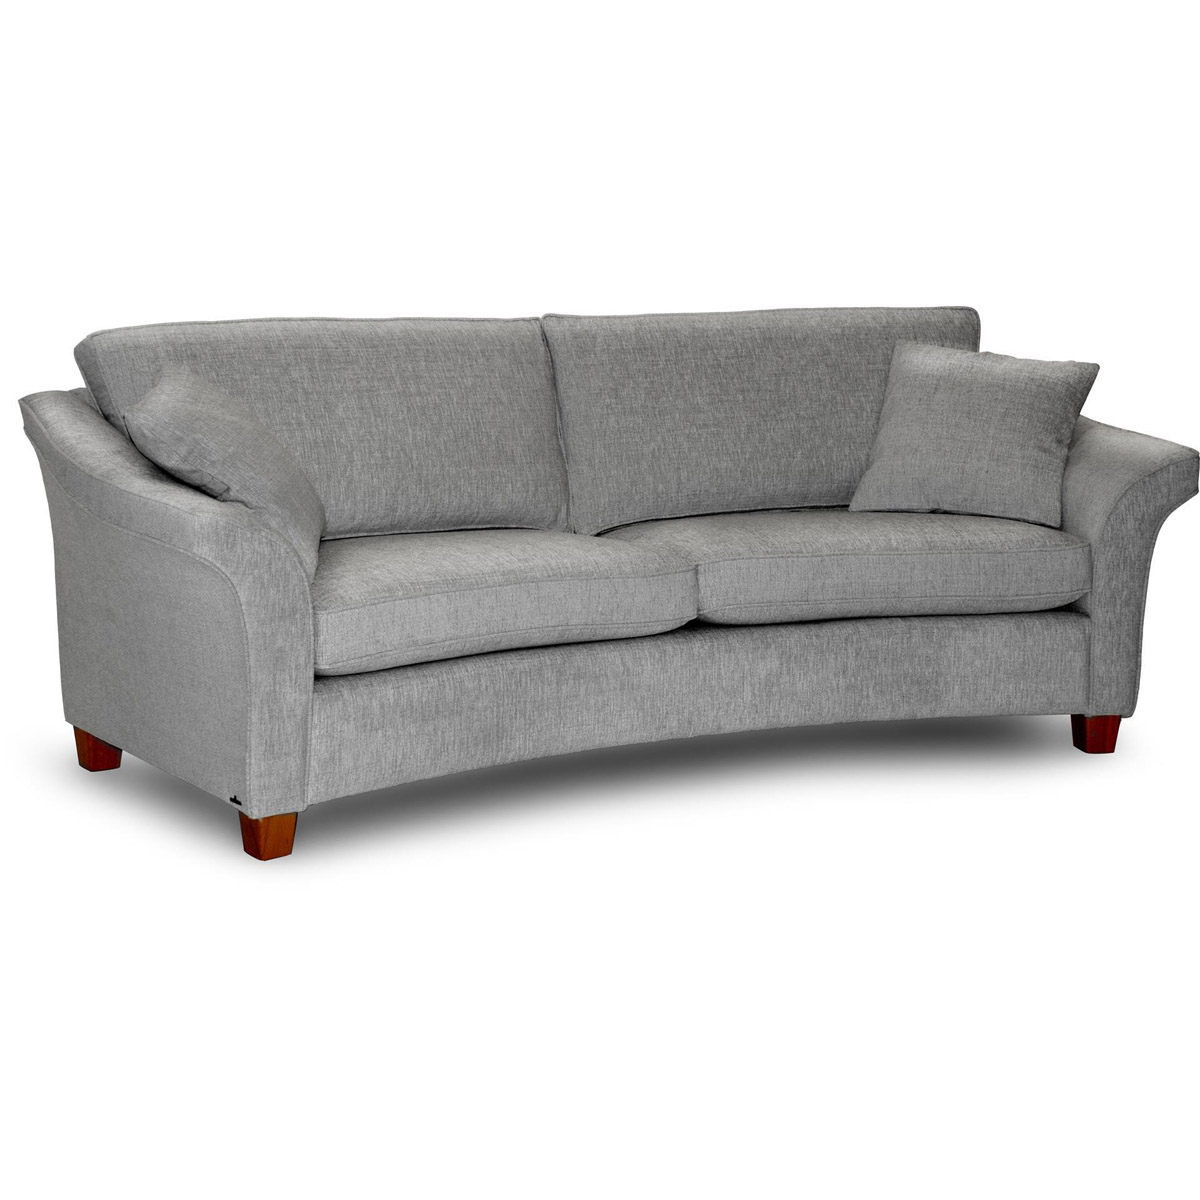 Alfa-soffa-svangd-memory56-2